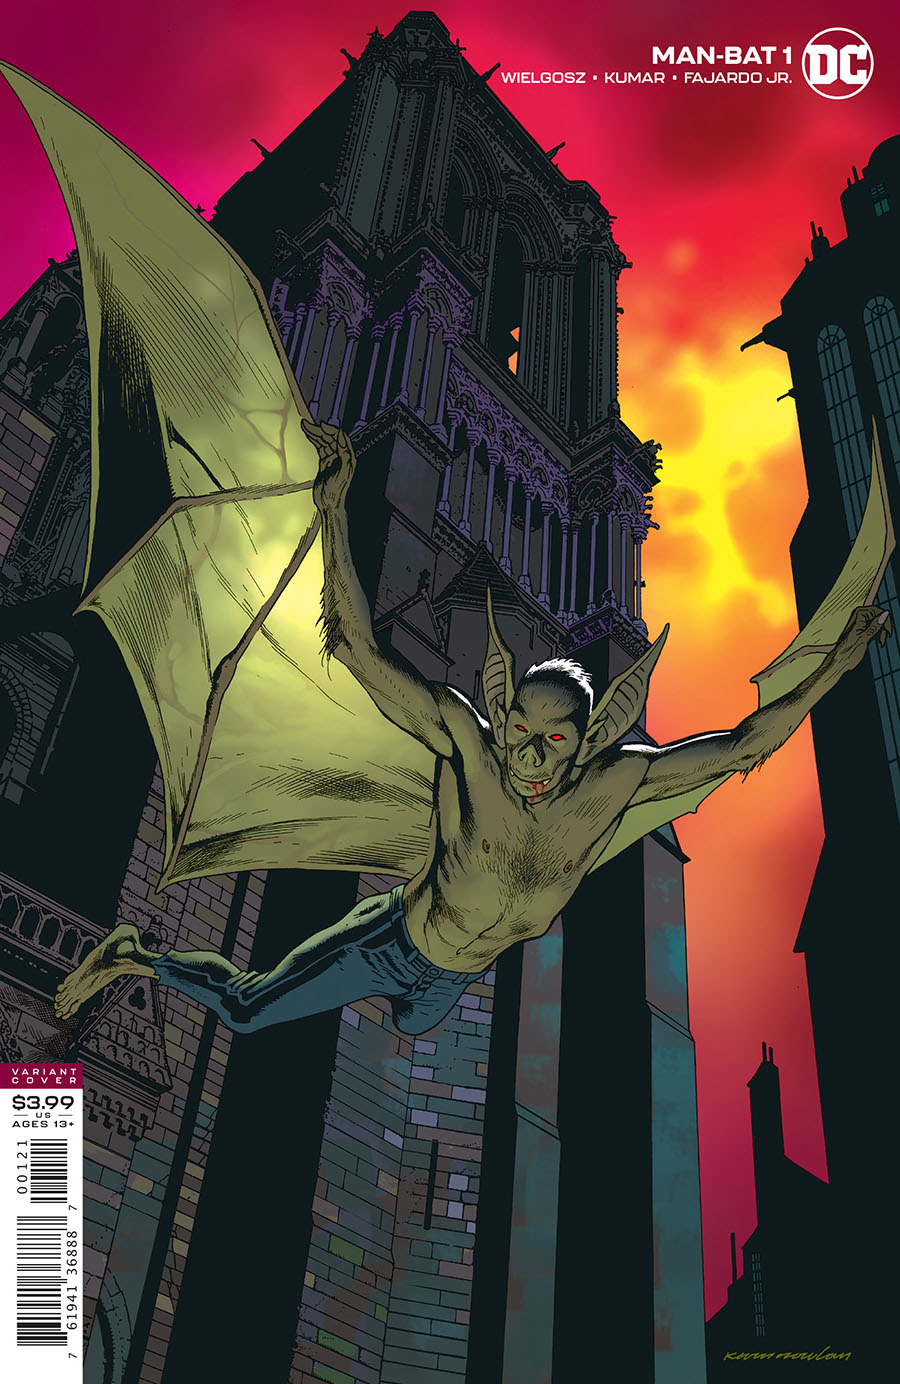 Man-Bat Vol 4 #1 Cover B Variant Kevin Nowlan Cover